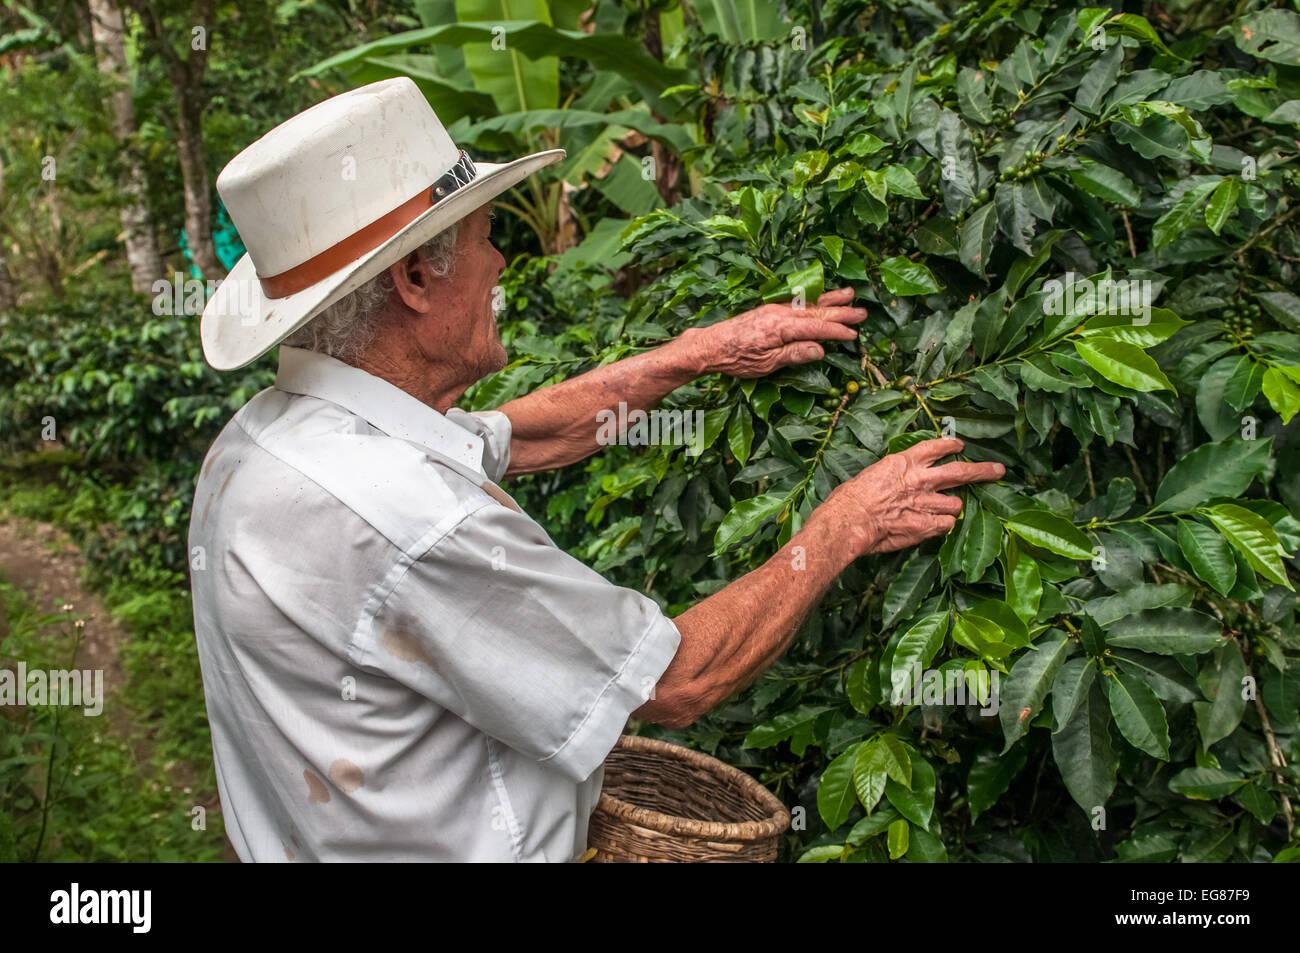 SALENTO, ZONA CAFETERIA, COLOMBIA - November, 28: Old farmer harvesting coffee beans on November, 28, 2009 in Salento, - Stock Image